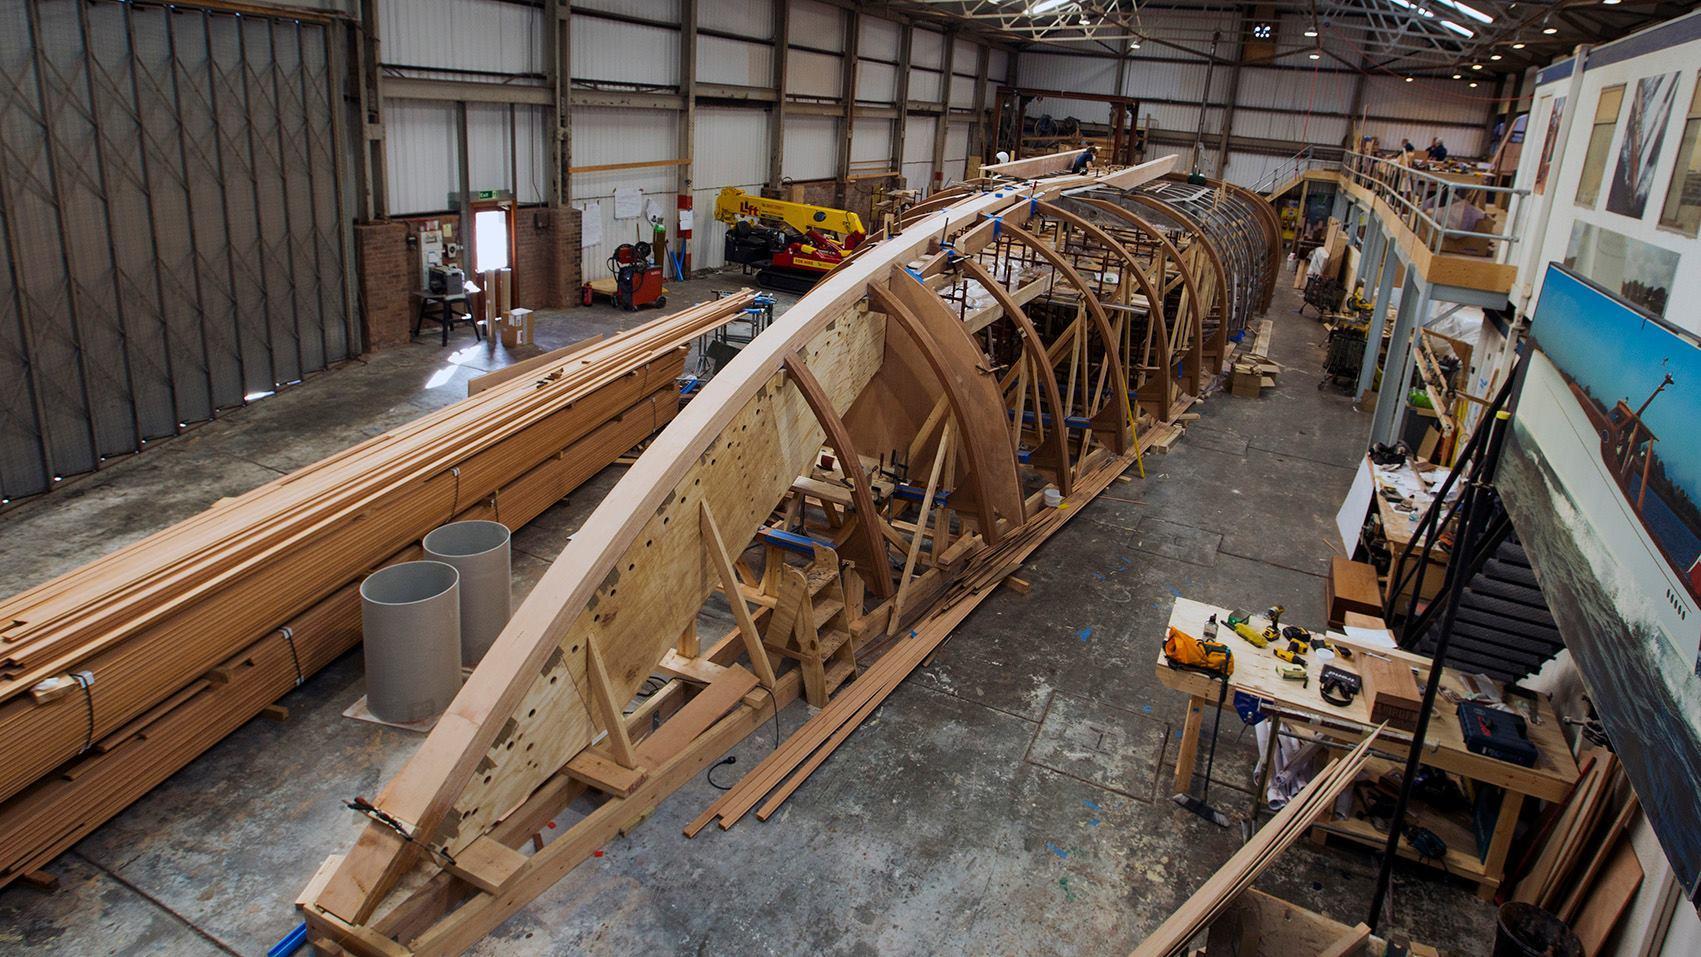 spirit 111 sailing yacht spirit yachts 34m 2019 under construction hull